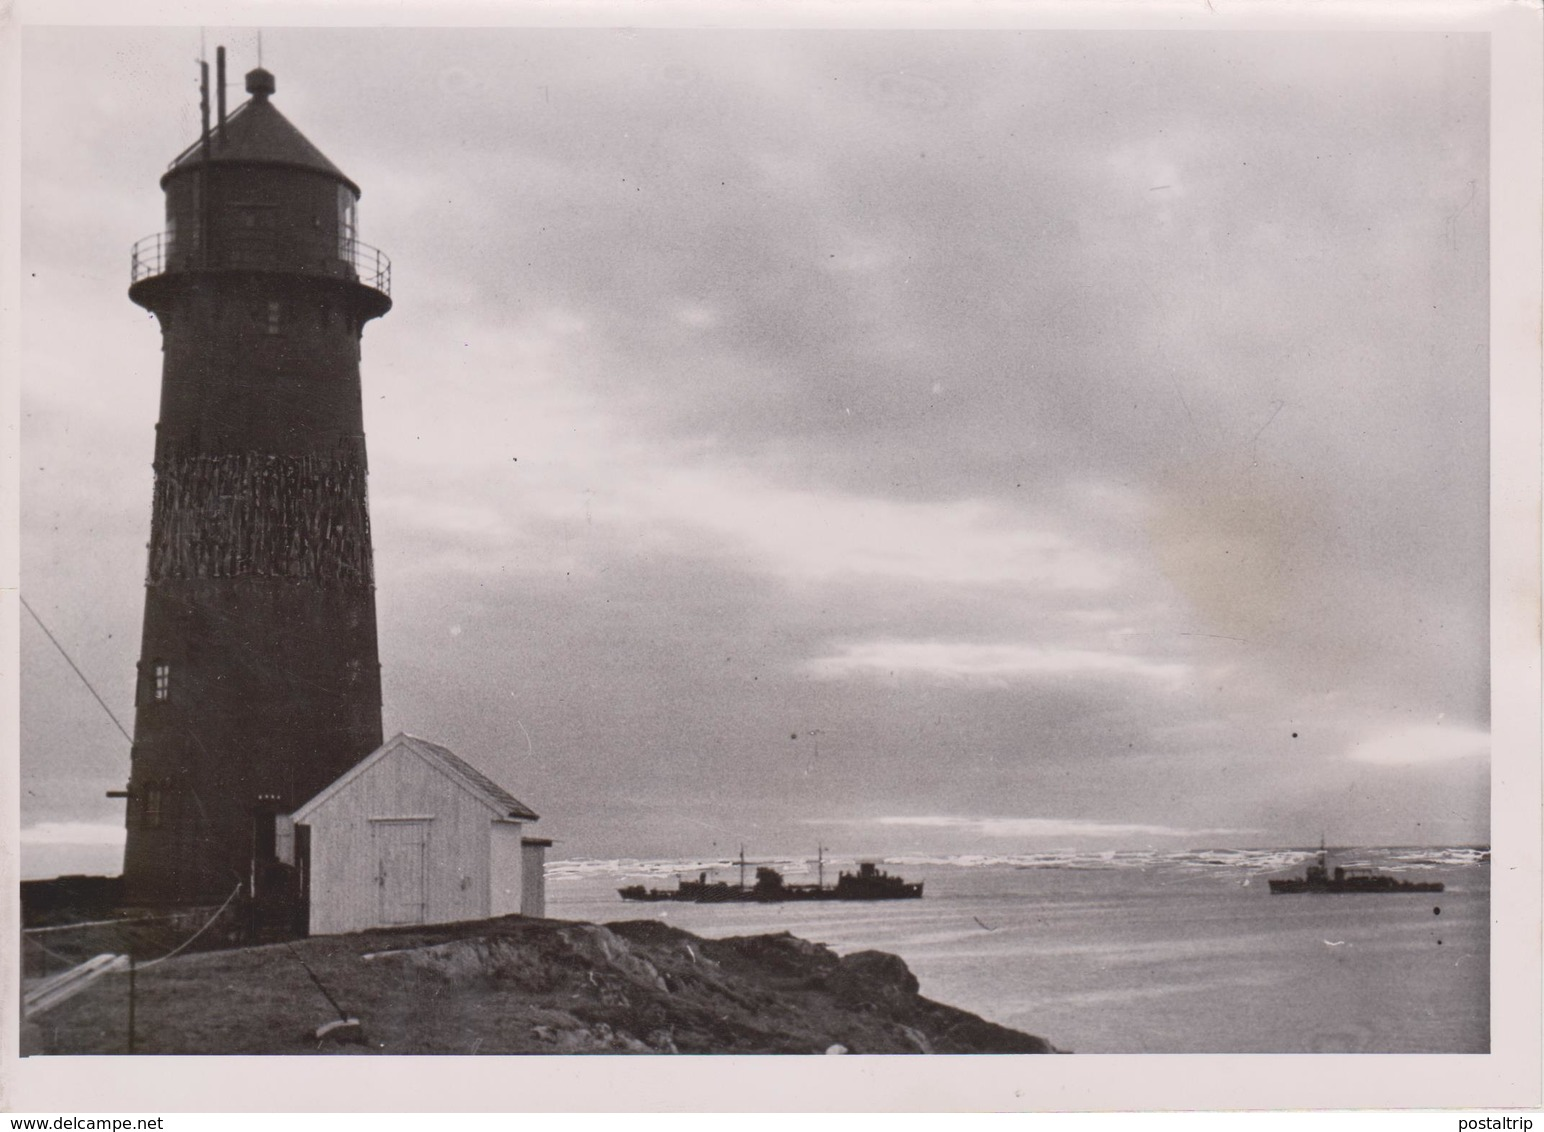 LIGHTHOUSE FARO NORWAY NORWEGEN FOTO DE PRESSE WW2 WWII WORLD WAR 2 WELTKRIEG Aleman Deutchland - Guerra, Militares